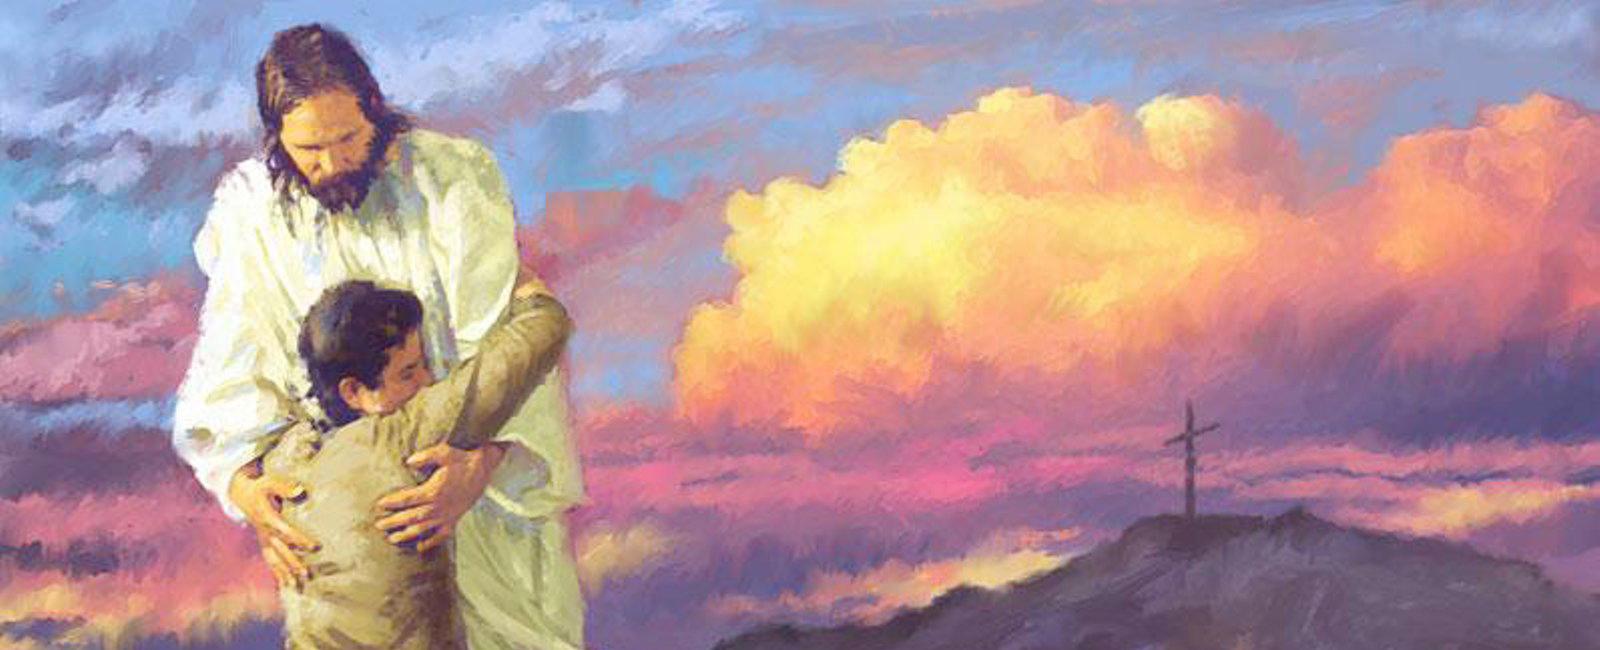 Parroquia El Altet - Pastoral de la Salud Jesus